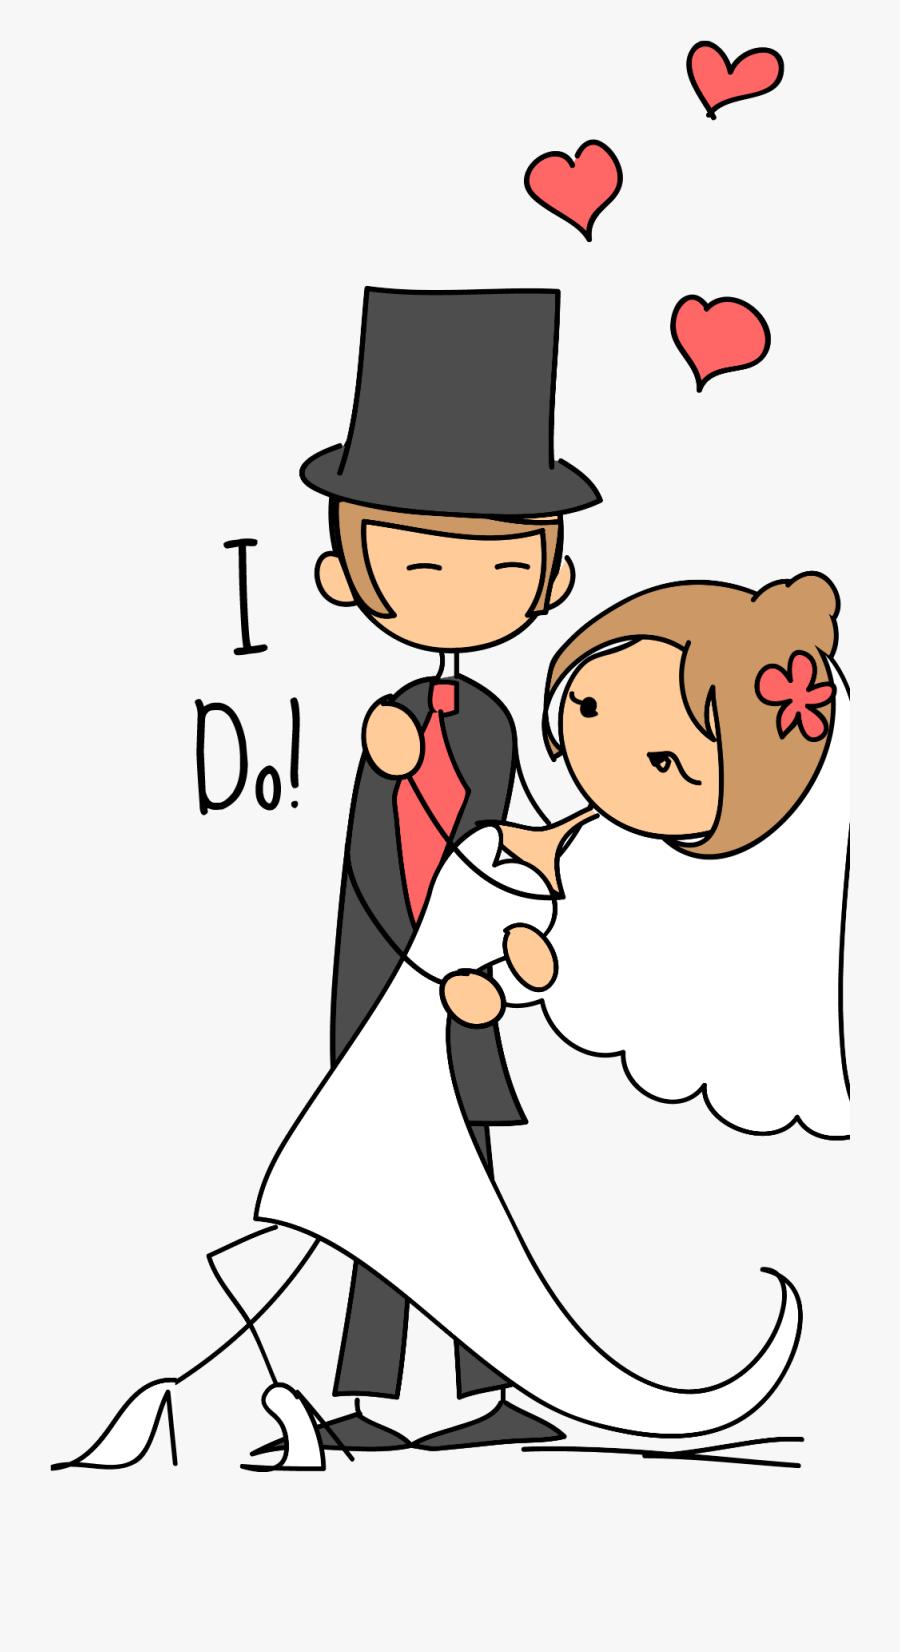 Transparent Hug Png - Wedding Couple Drawing Png, Transparent Clipart